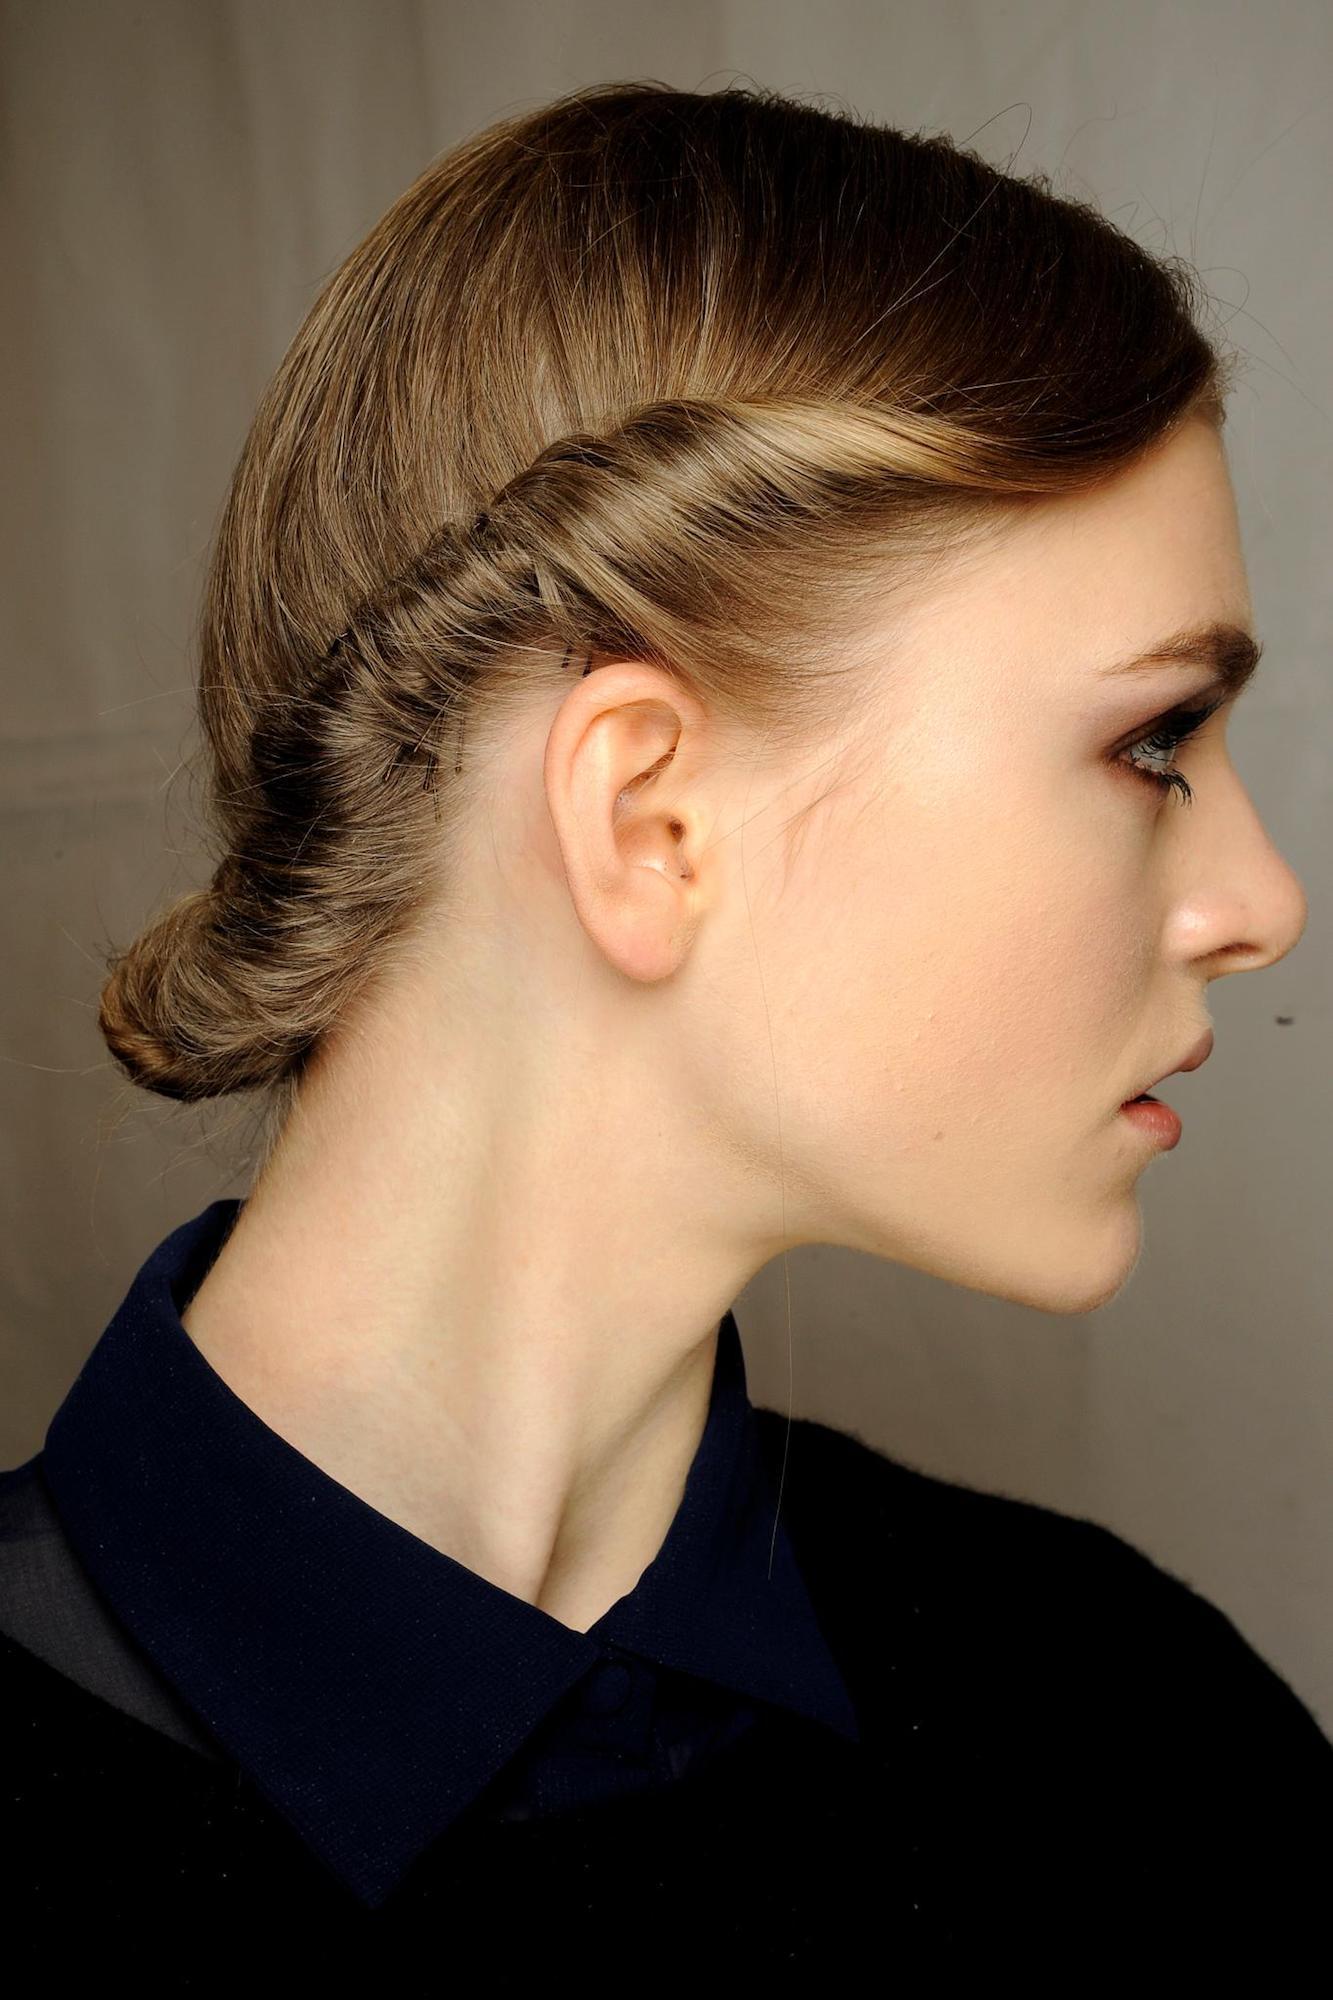 Gaya rambut twist dengan gaya rambut chignon.